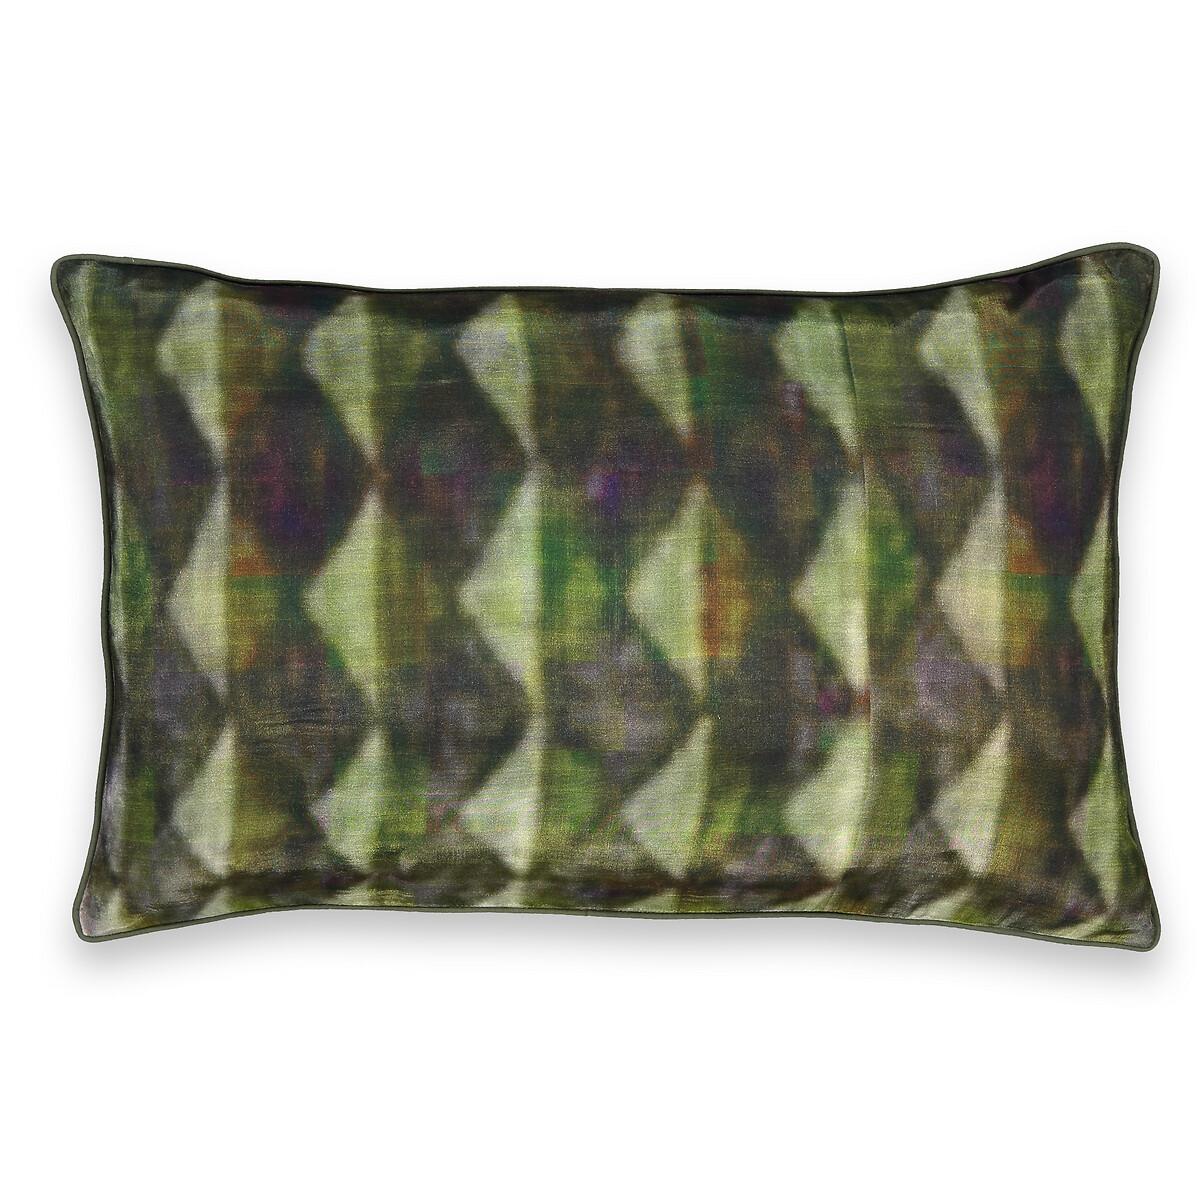 Фото - Чехол LaRedoute На подушку Shatou 60 x 40 см зеленый чехол laredoute на подушку валик с отделкой бисером volodia 45 x 45 см зеленый